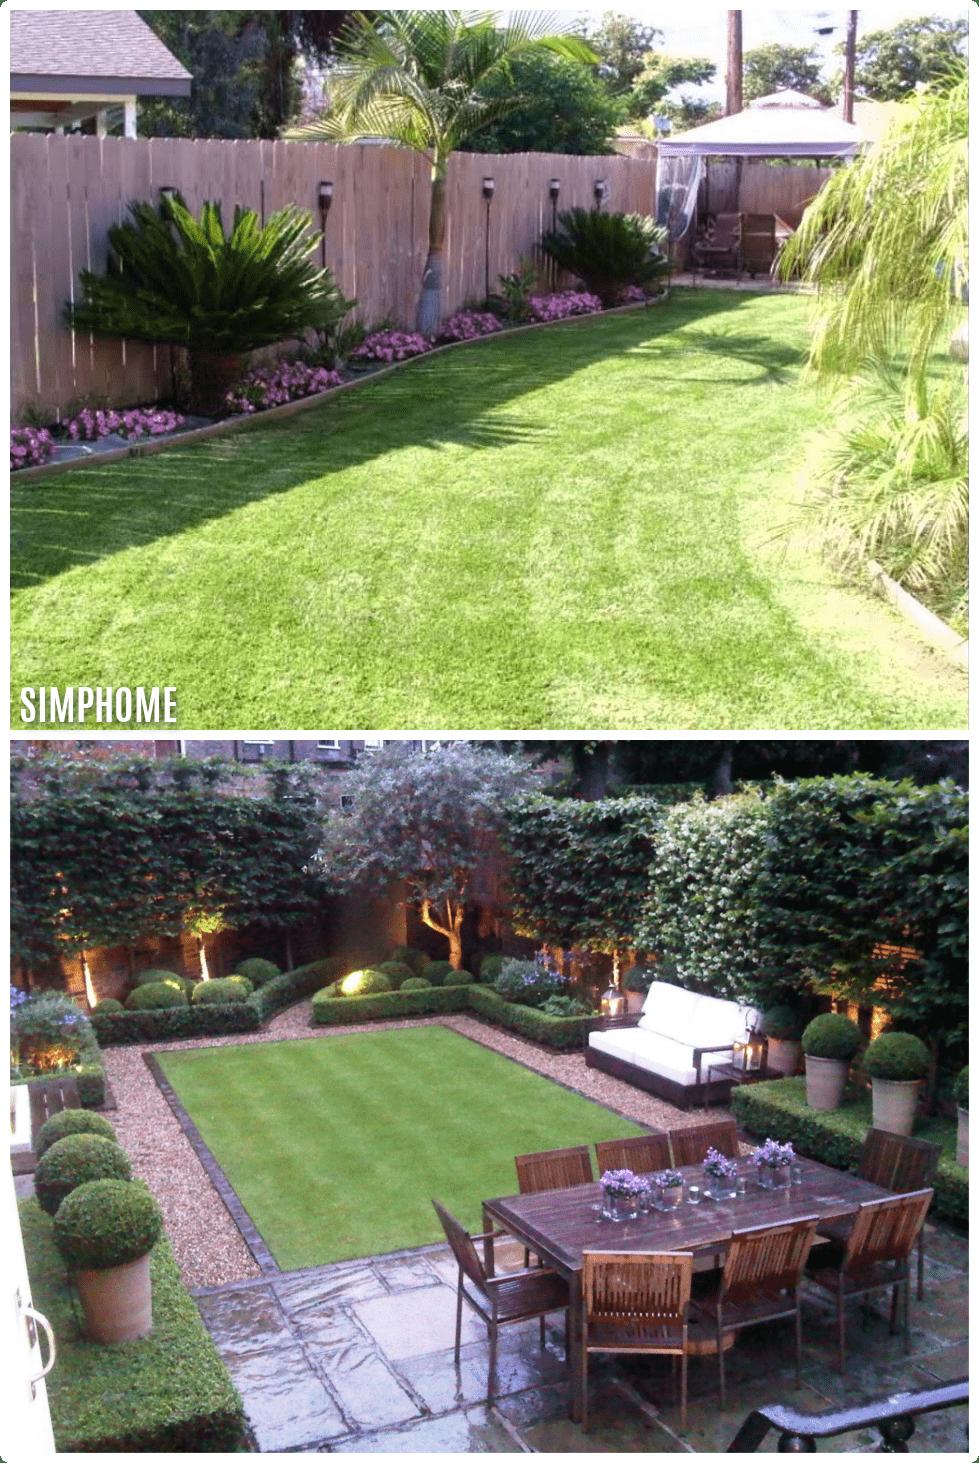 Simphome.com laurens garden inspiration small yard idea 2020 2021 2022